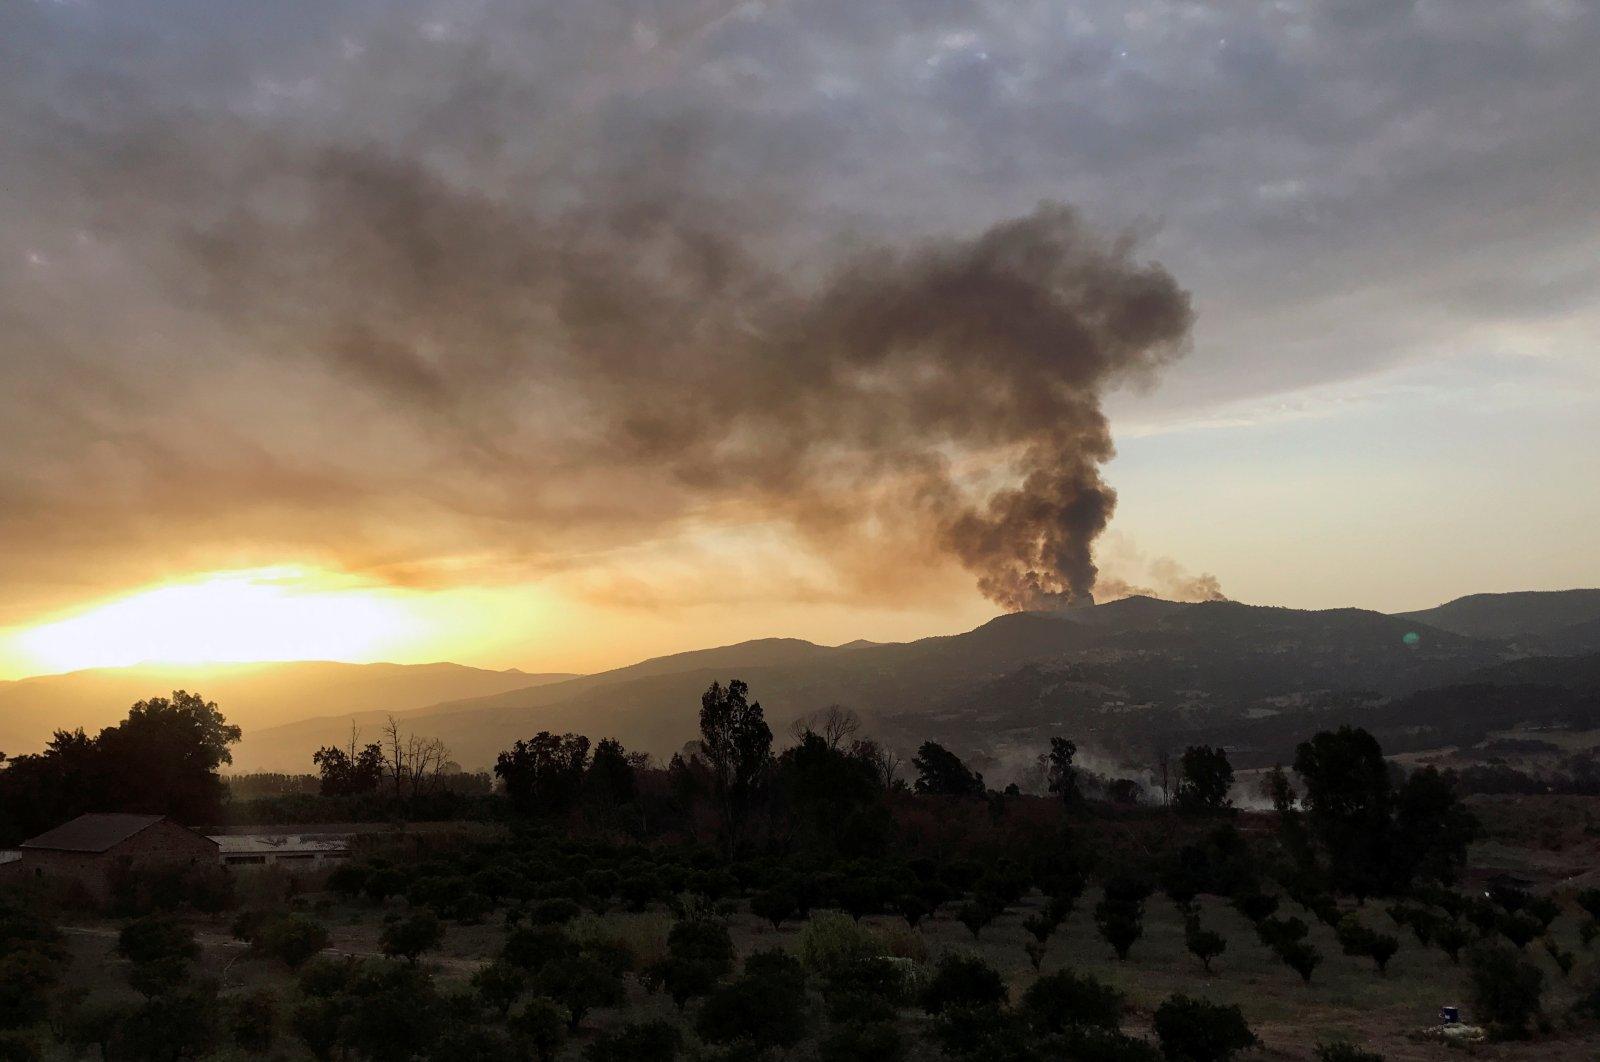 Smoke rises following a wildfire in Bejaia province, Algeria, Aug. 16, 2021. (Reuters Photo)